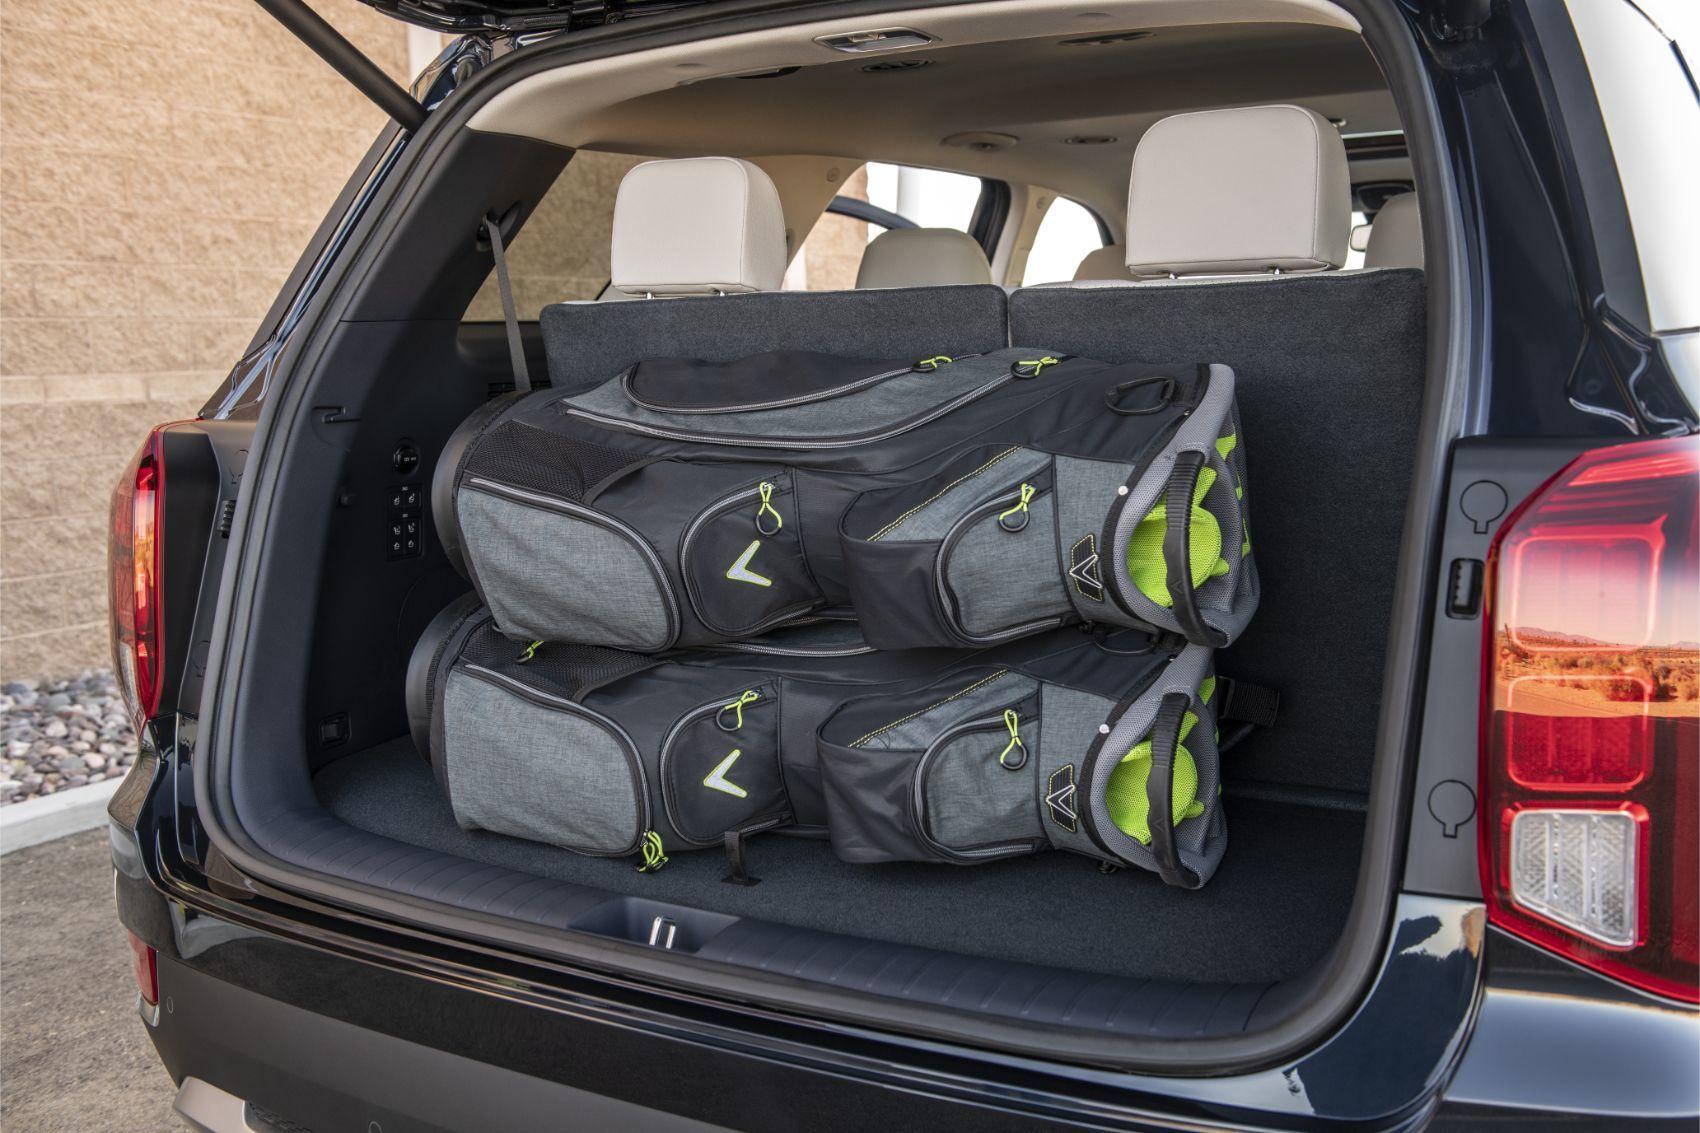 2020 Hyundai Palisade rear cargo area.